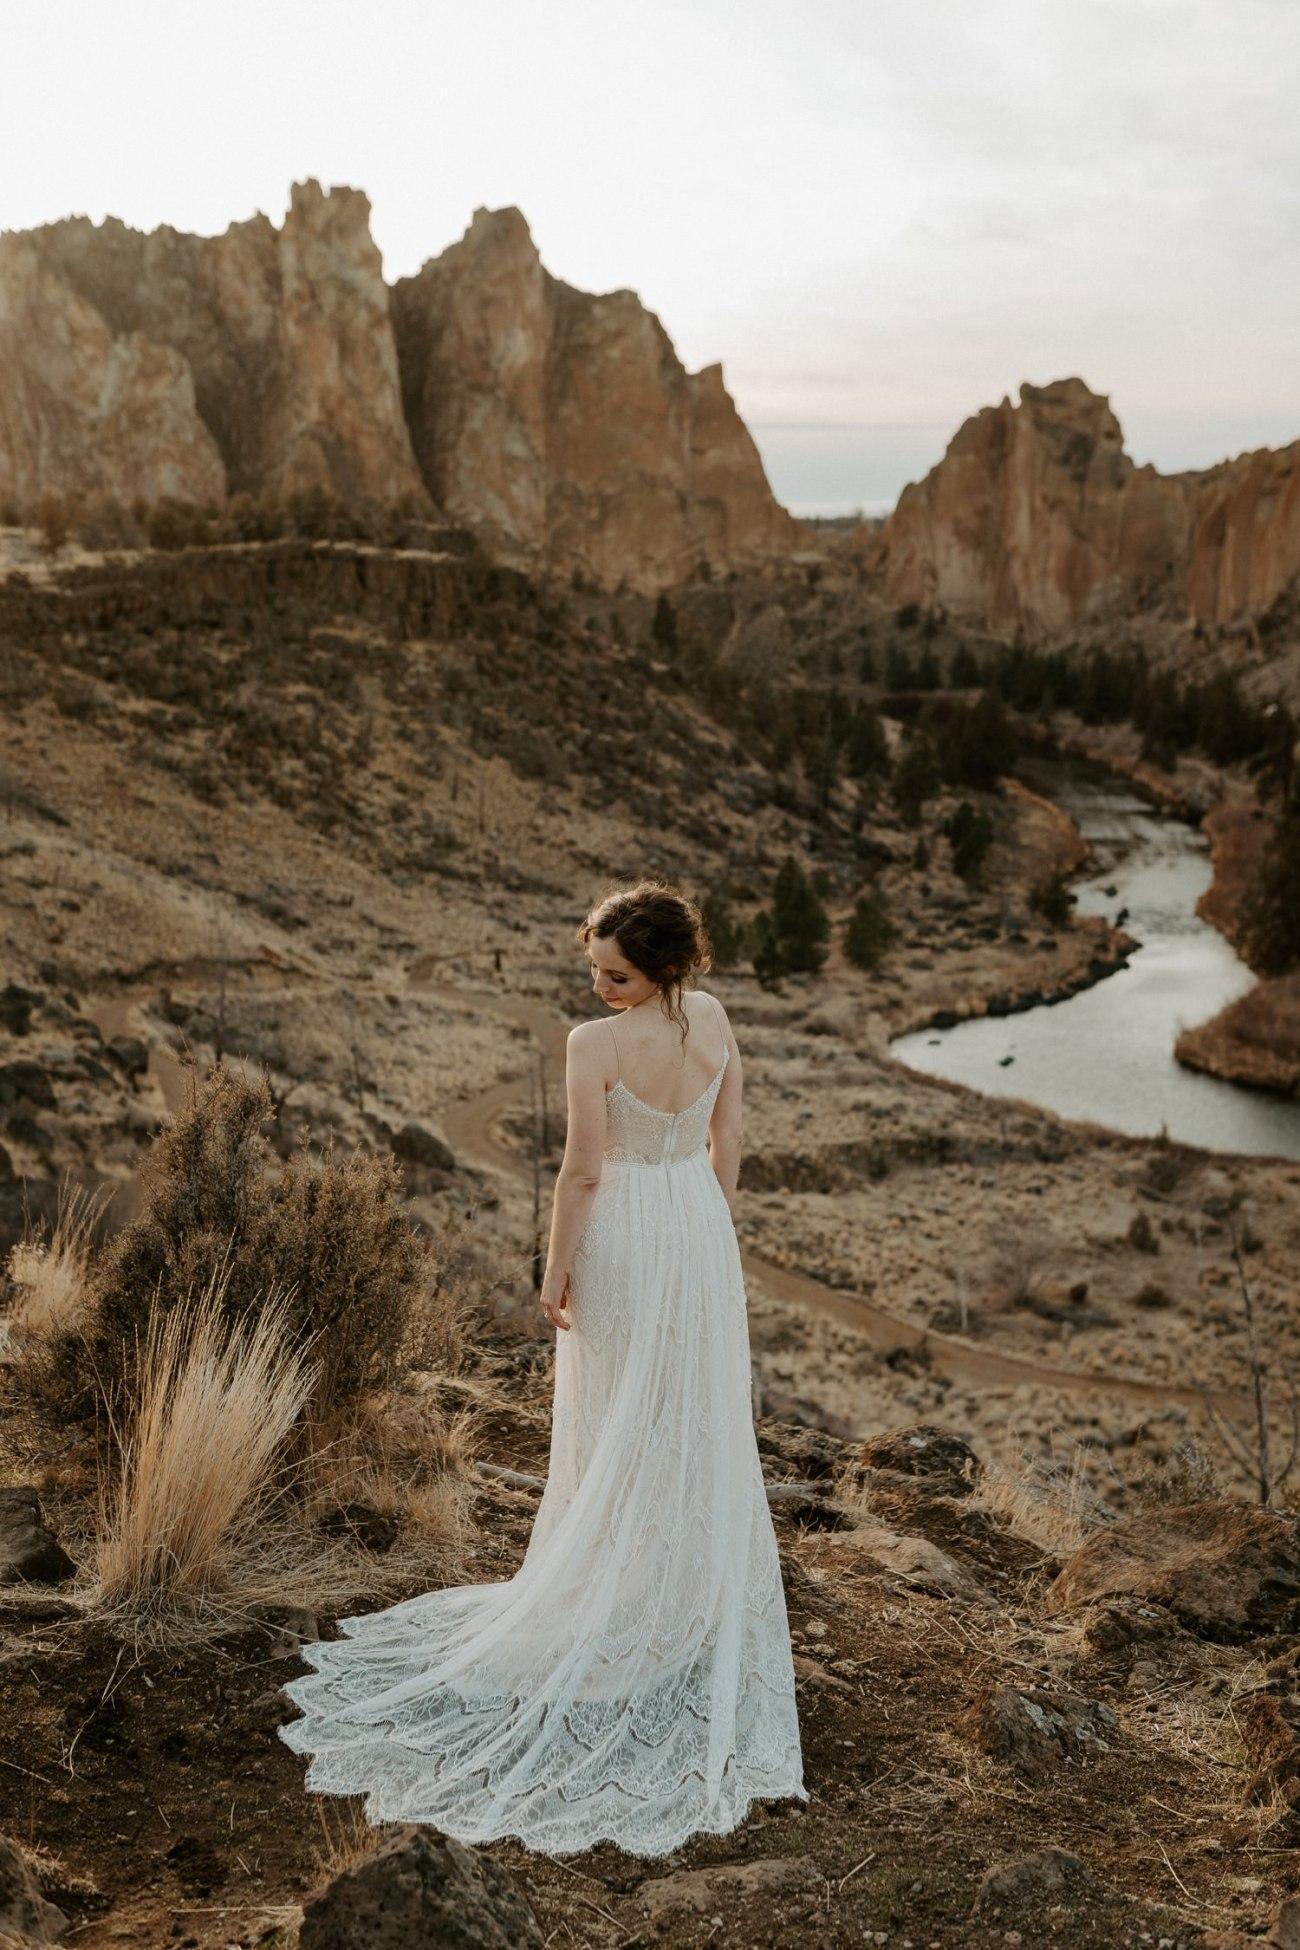 Smith Rock State Park Elopement Bend Oregon Elopement Photographer Anais Possamai Photography 024